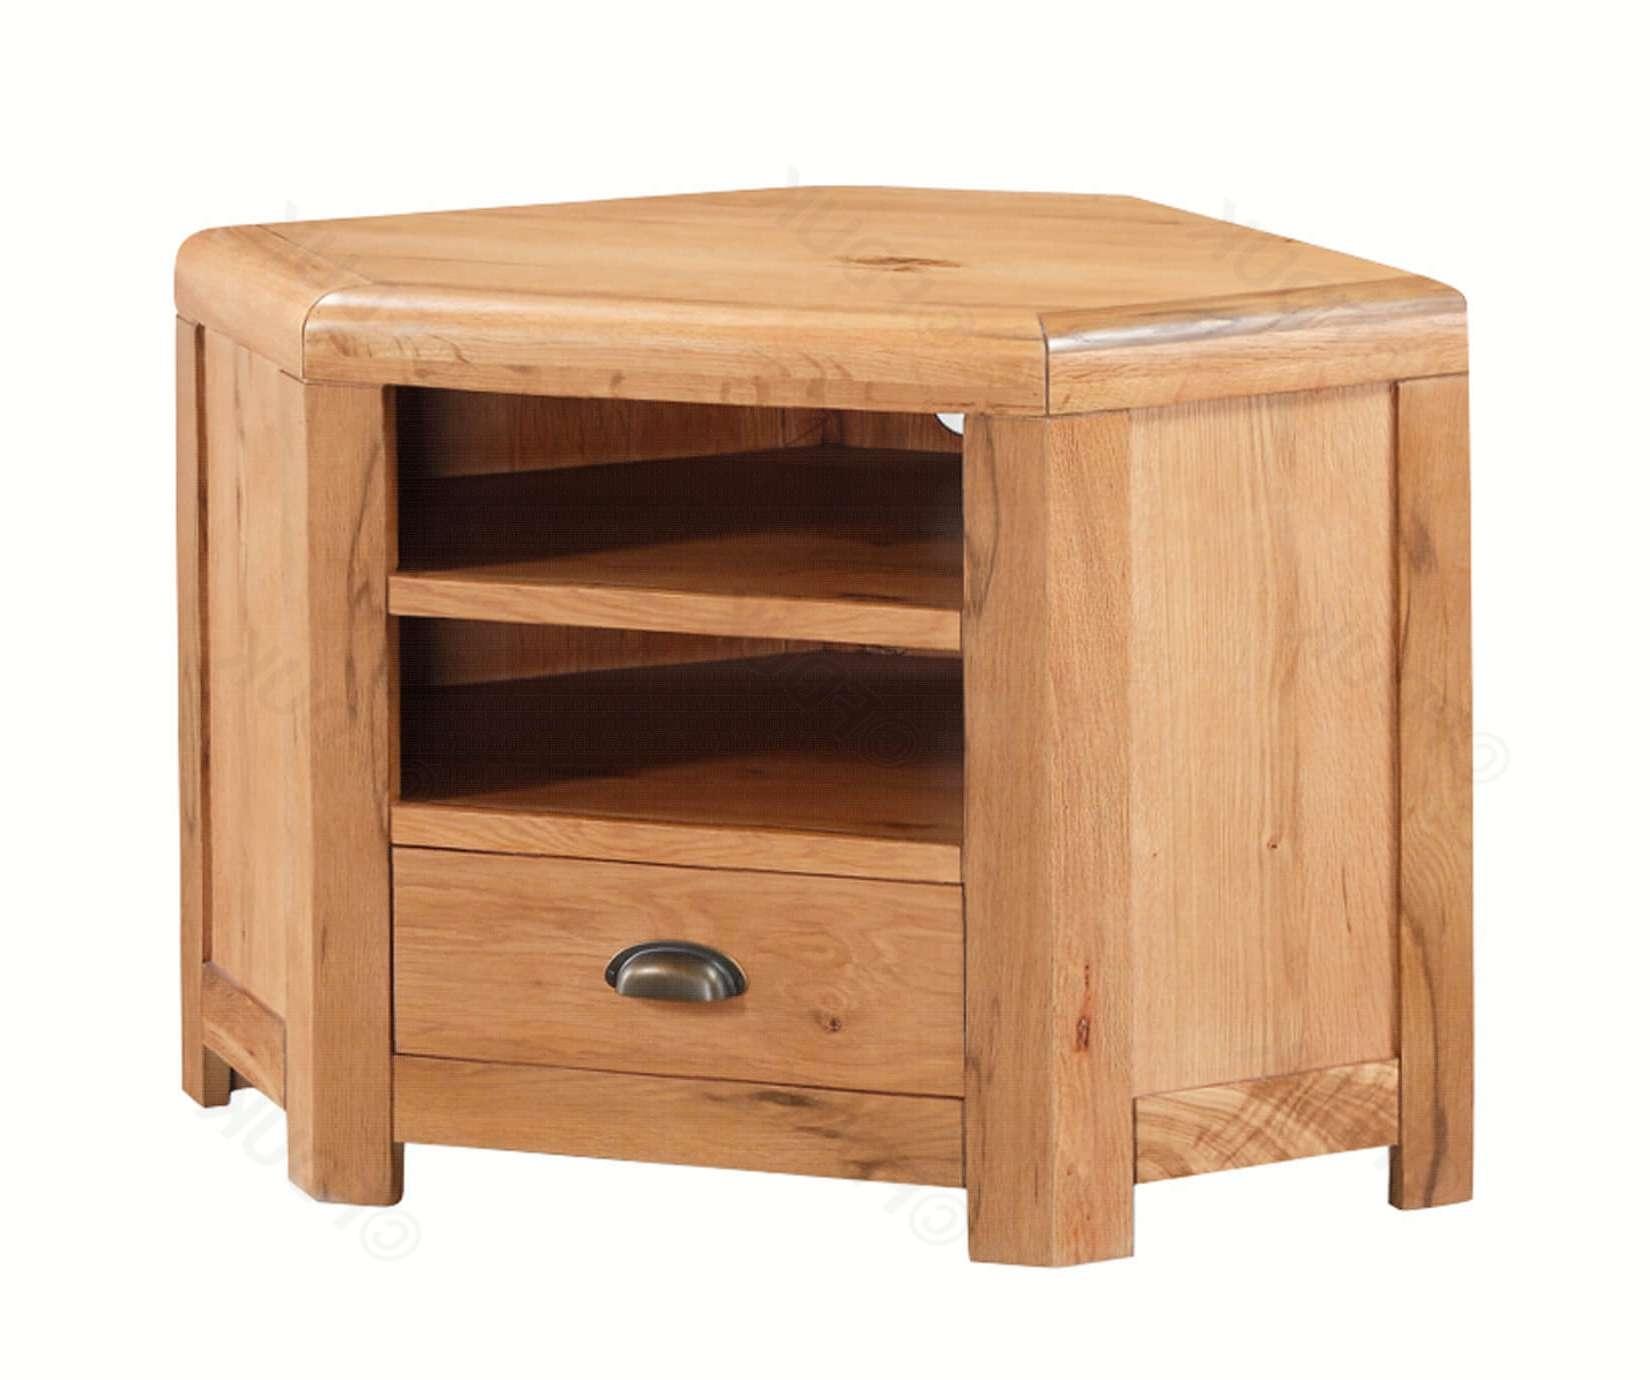 Annaghmore | Oakridge Solid Oak Corner Tv Unit | Furnituredirectuk With Solid Oak Corner Tv Cabinets (View 1 of 20)